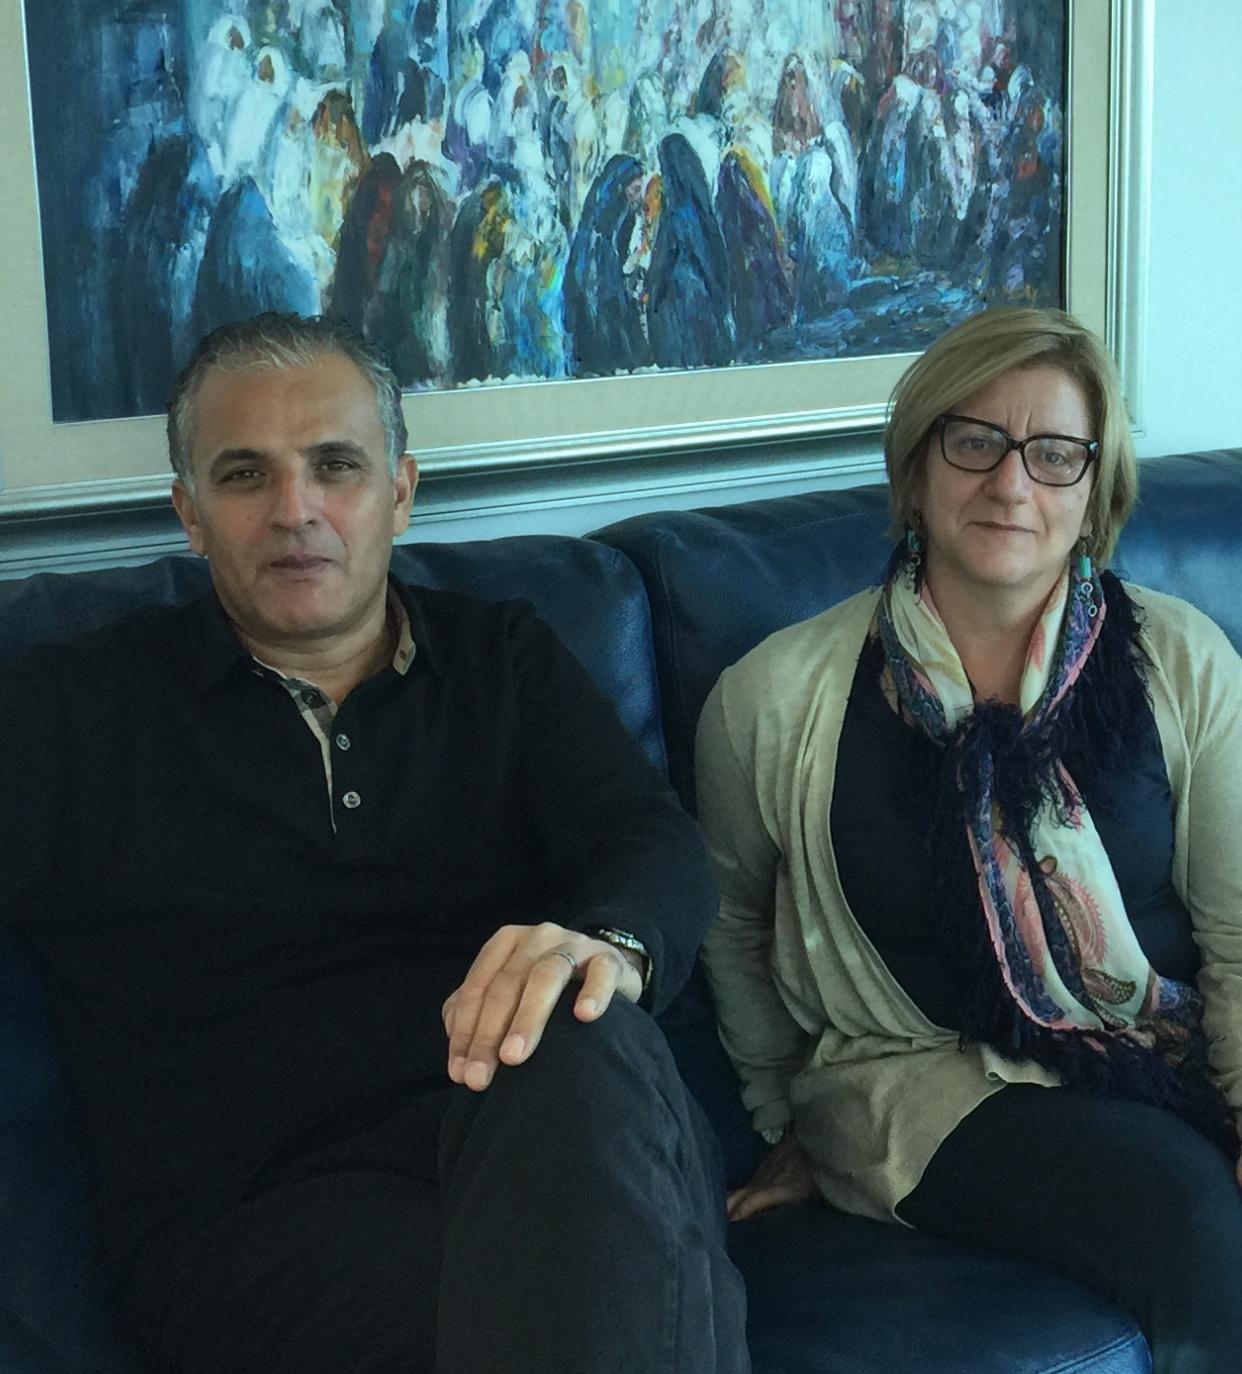 Kamel and Hela in Tunisia